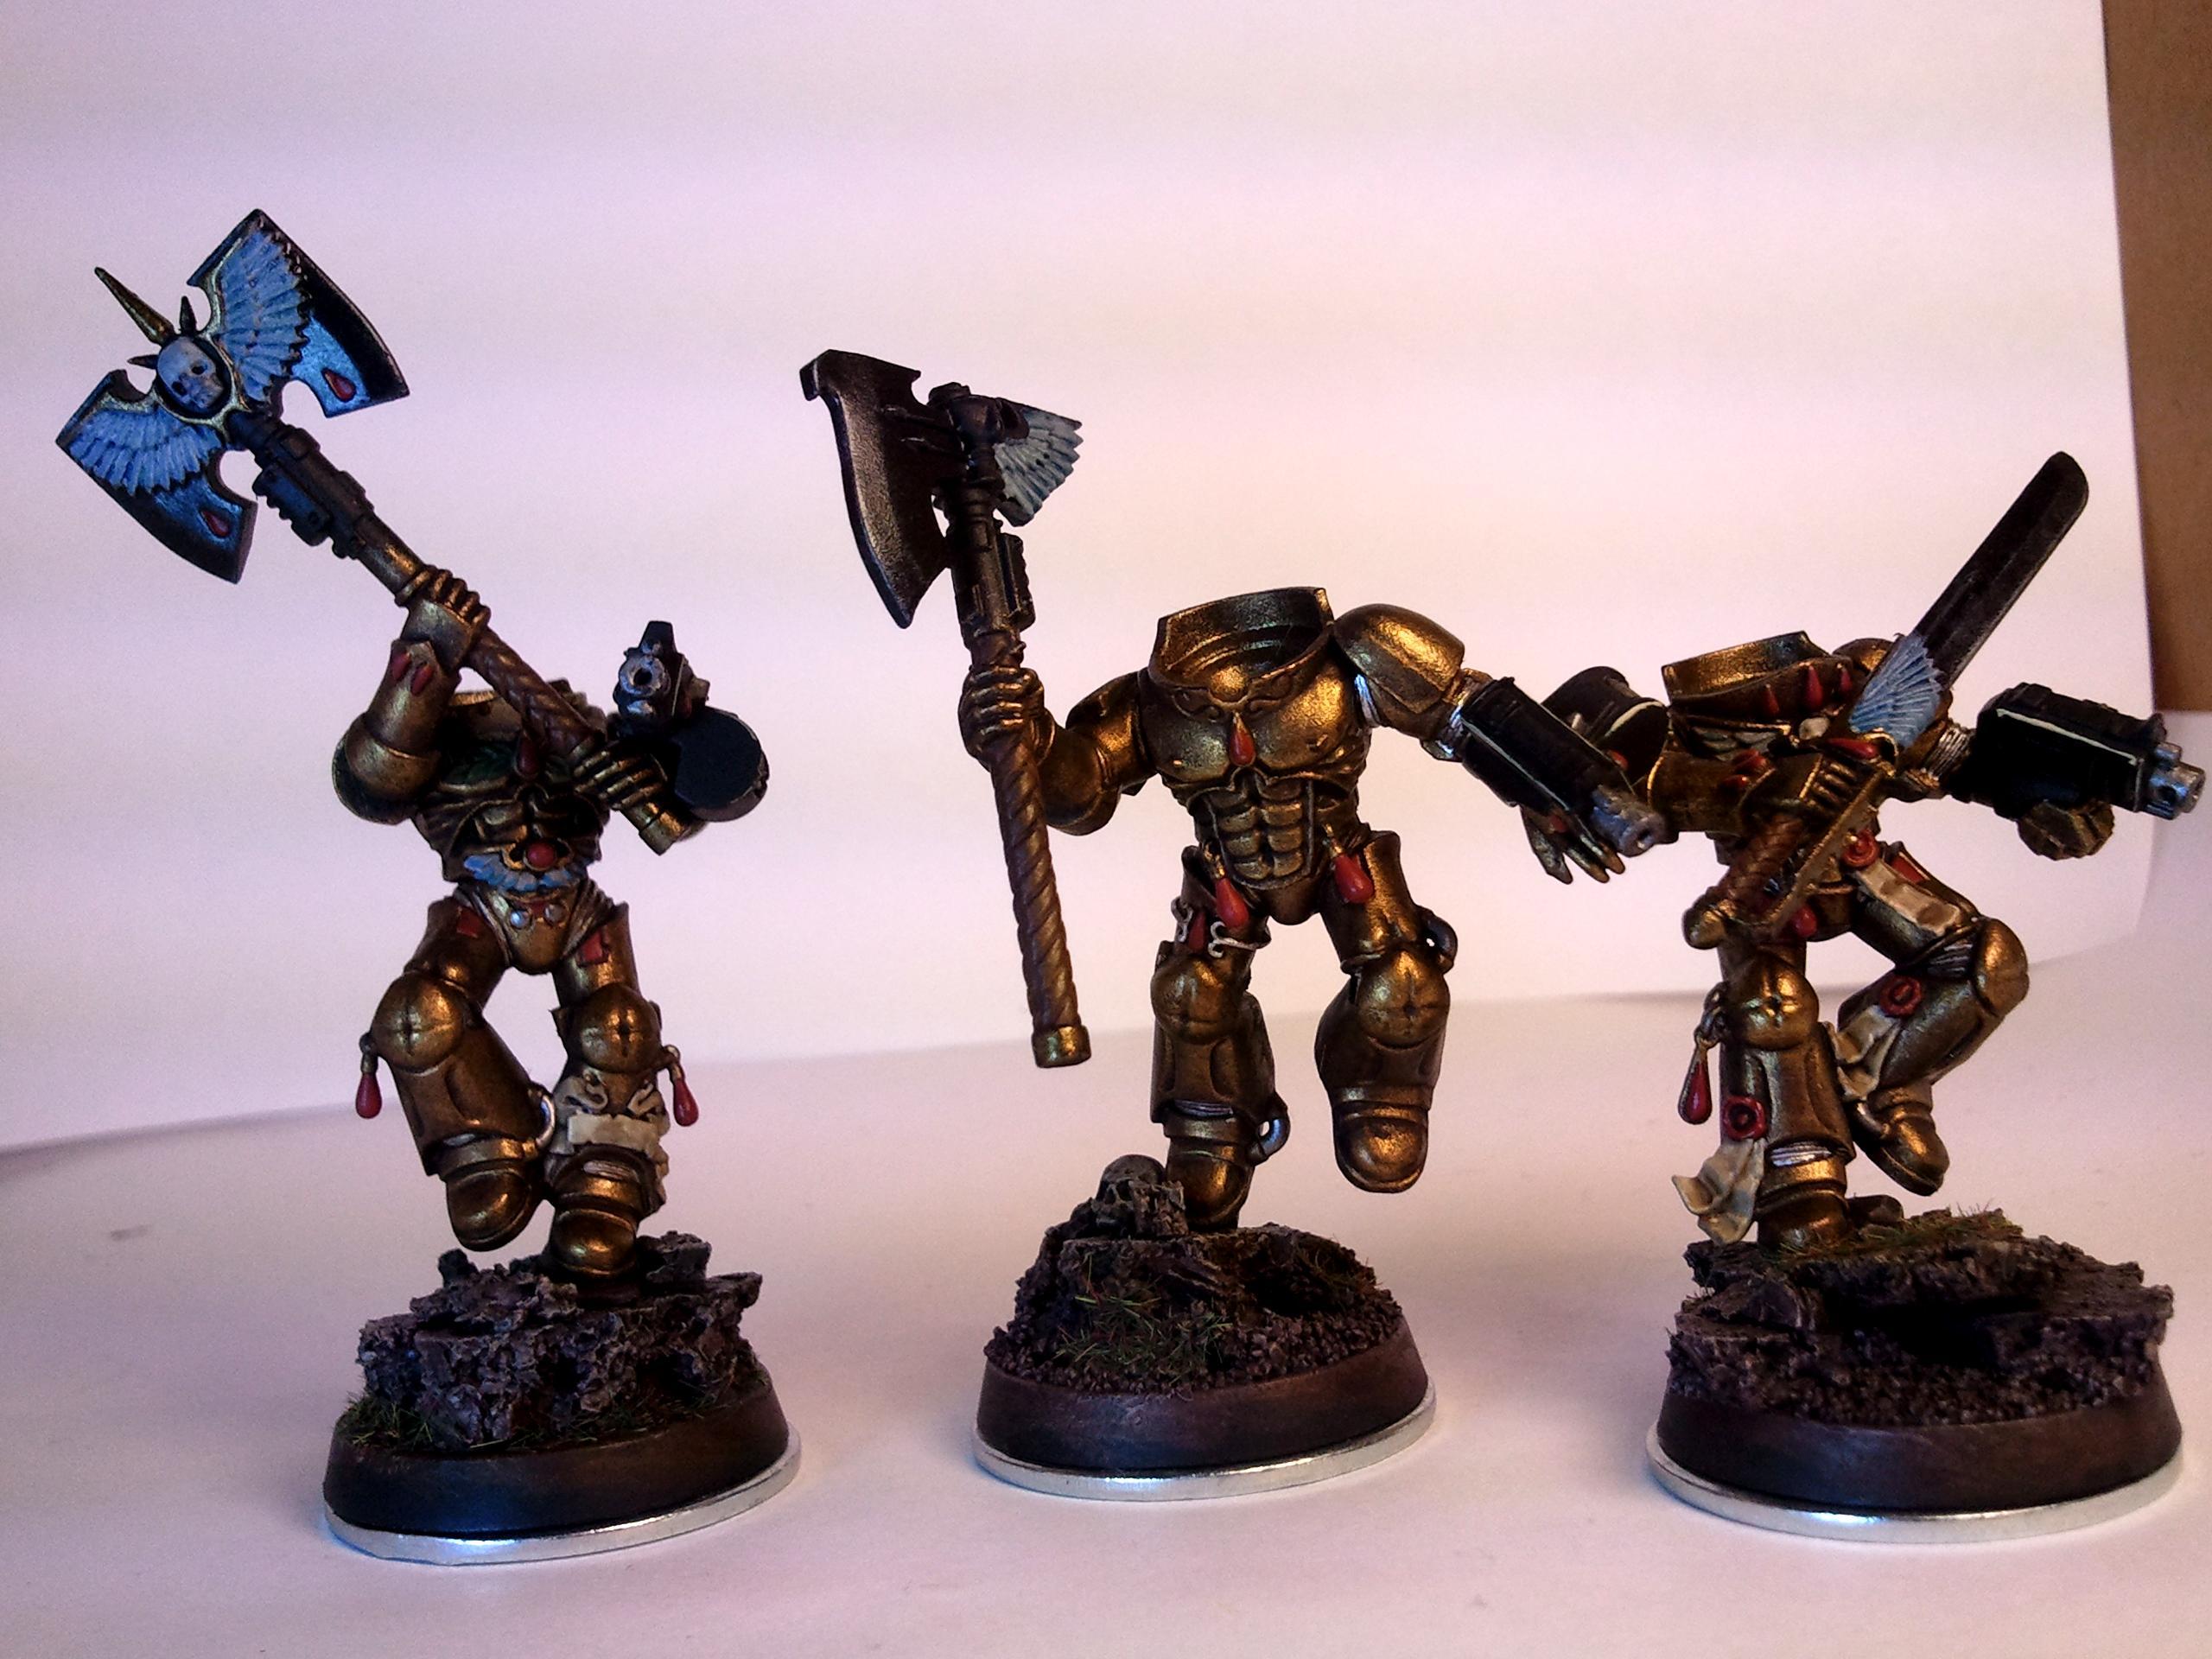 Angel, Blood, Guard, Sanguinary, Space, Space Marines, Warhammer 40,000, Warhammer Fantasy